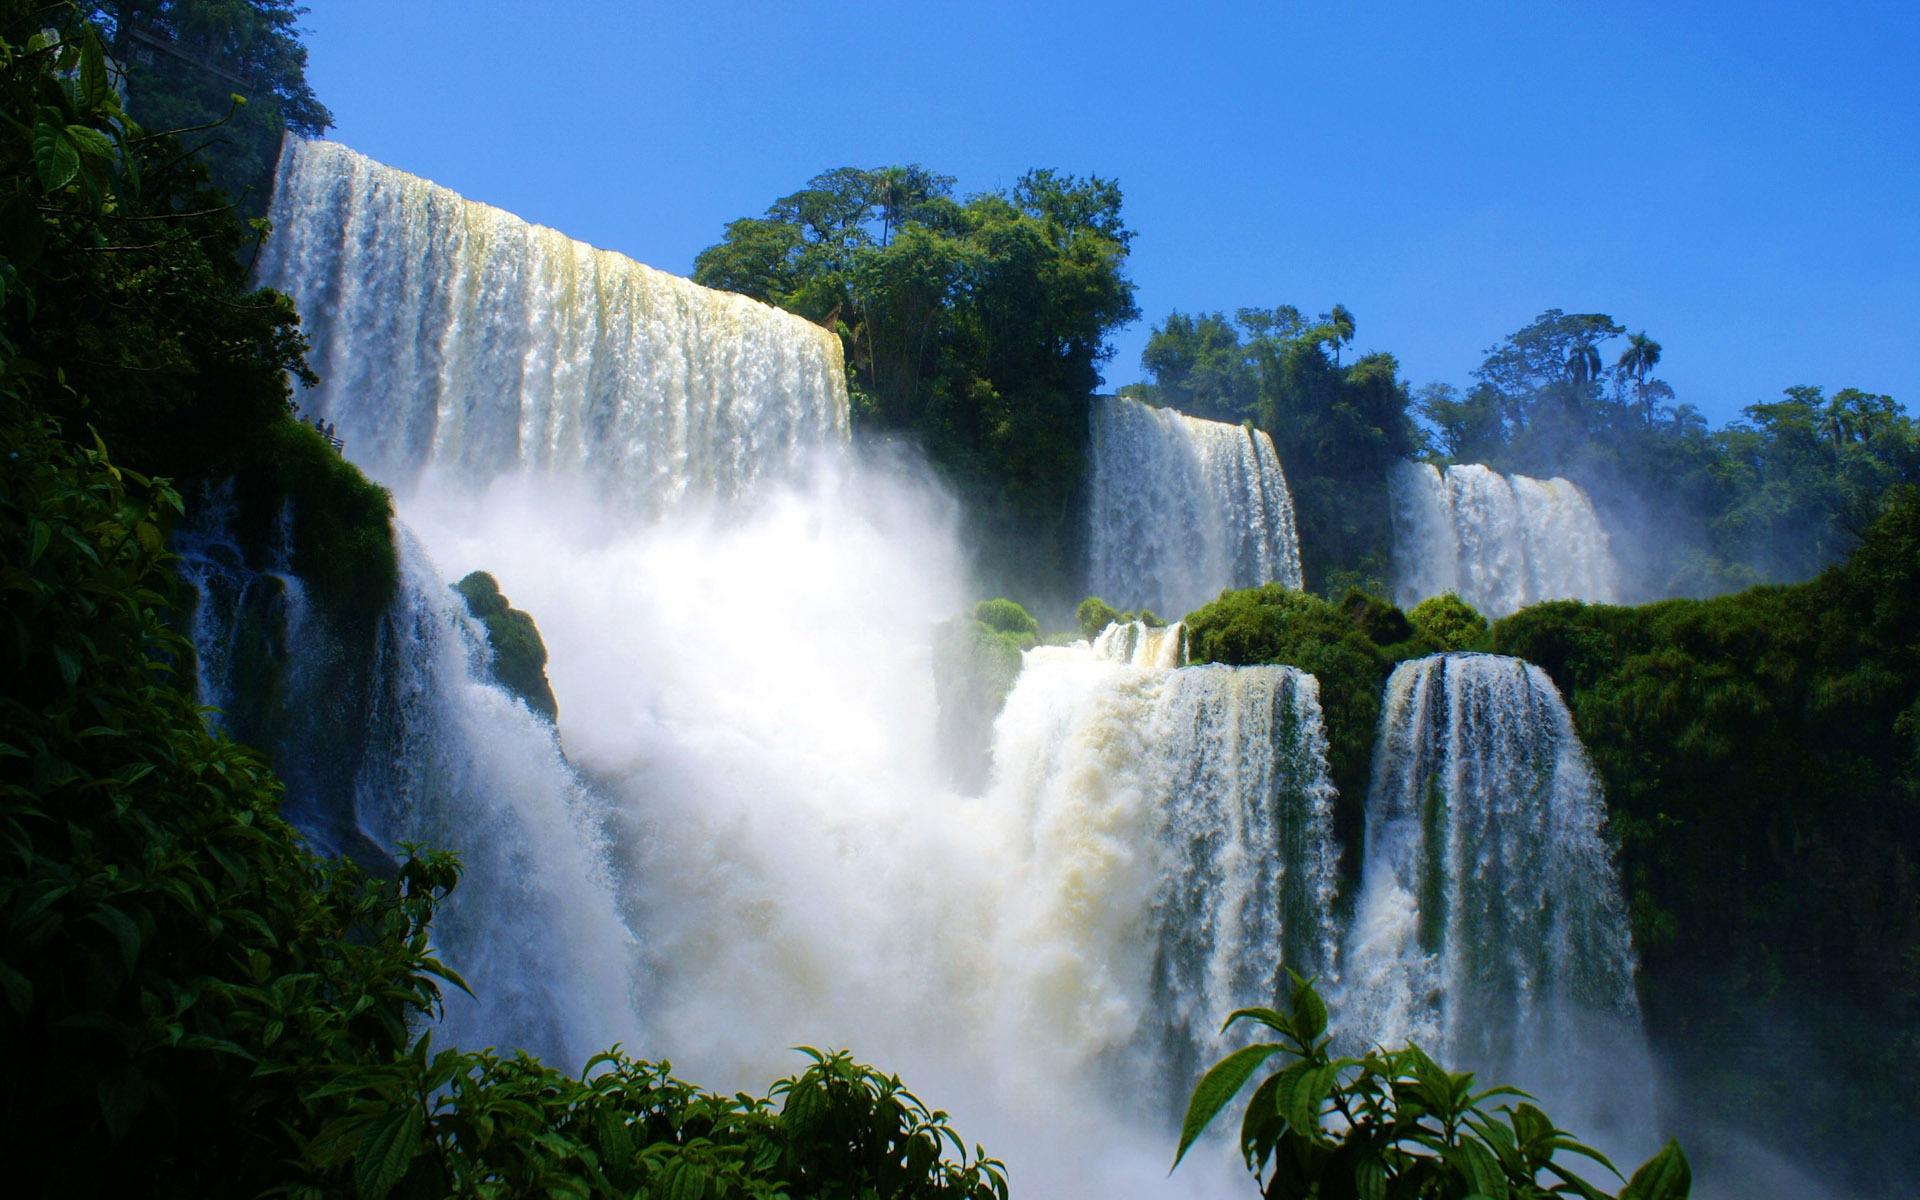 waterfall-nature-hd-wallpaper-1920x1200-9605